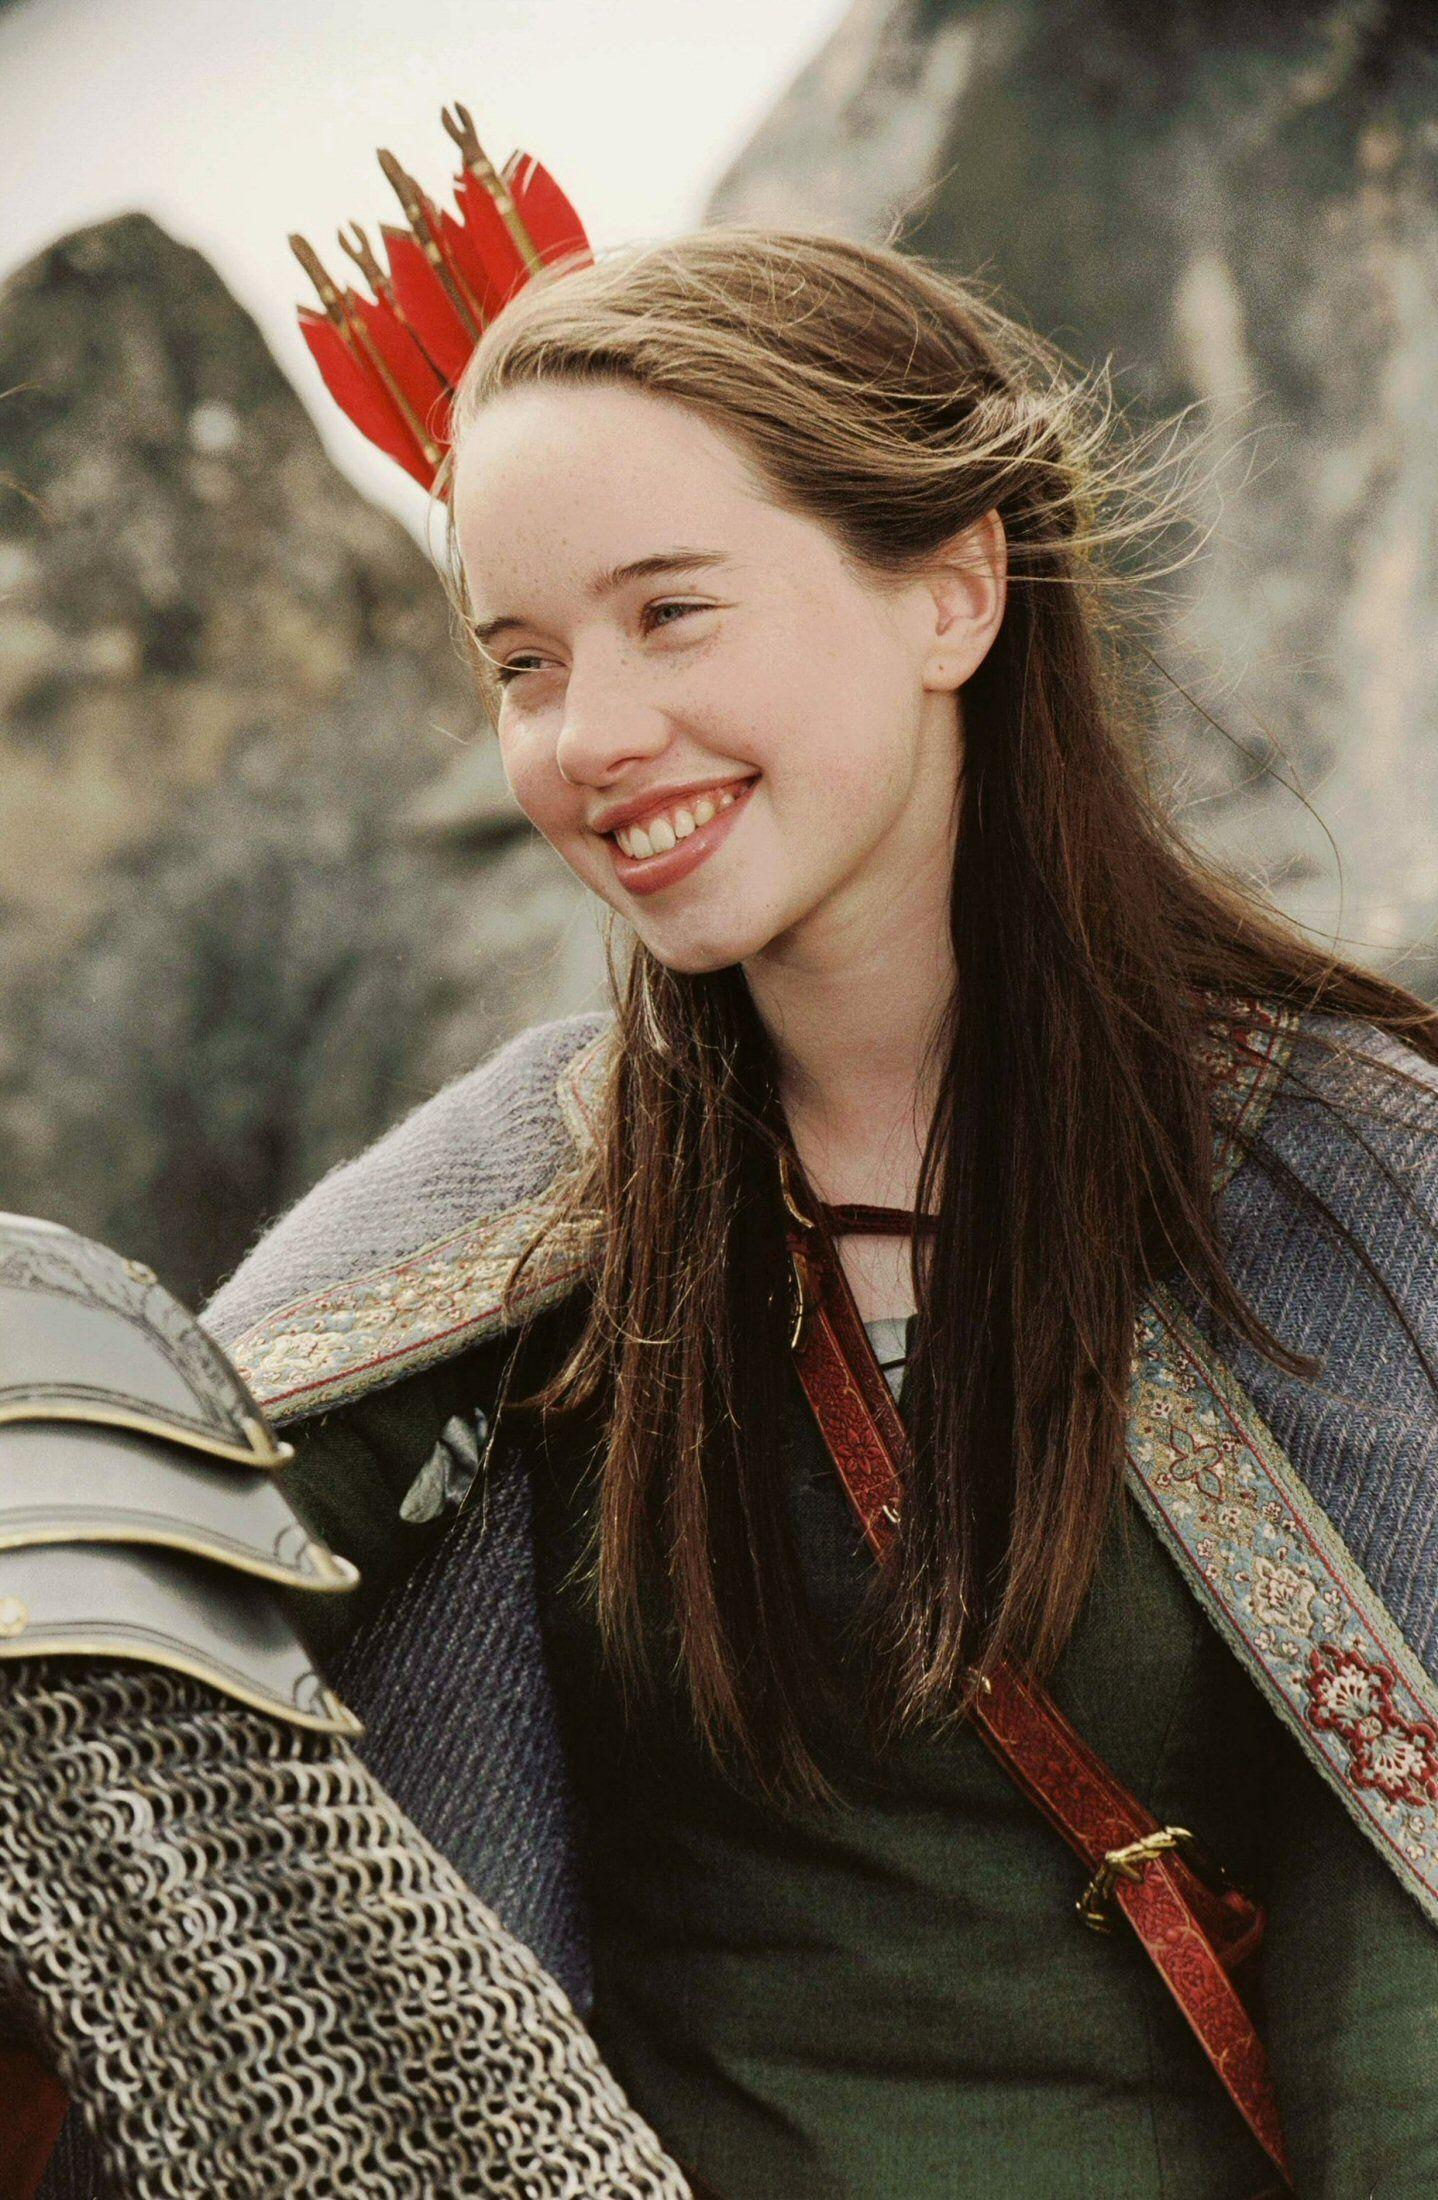 Susan narnia Chronicles of narnia, Narnia, Anna popplewell